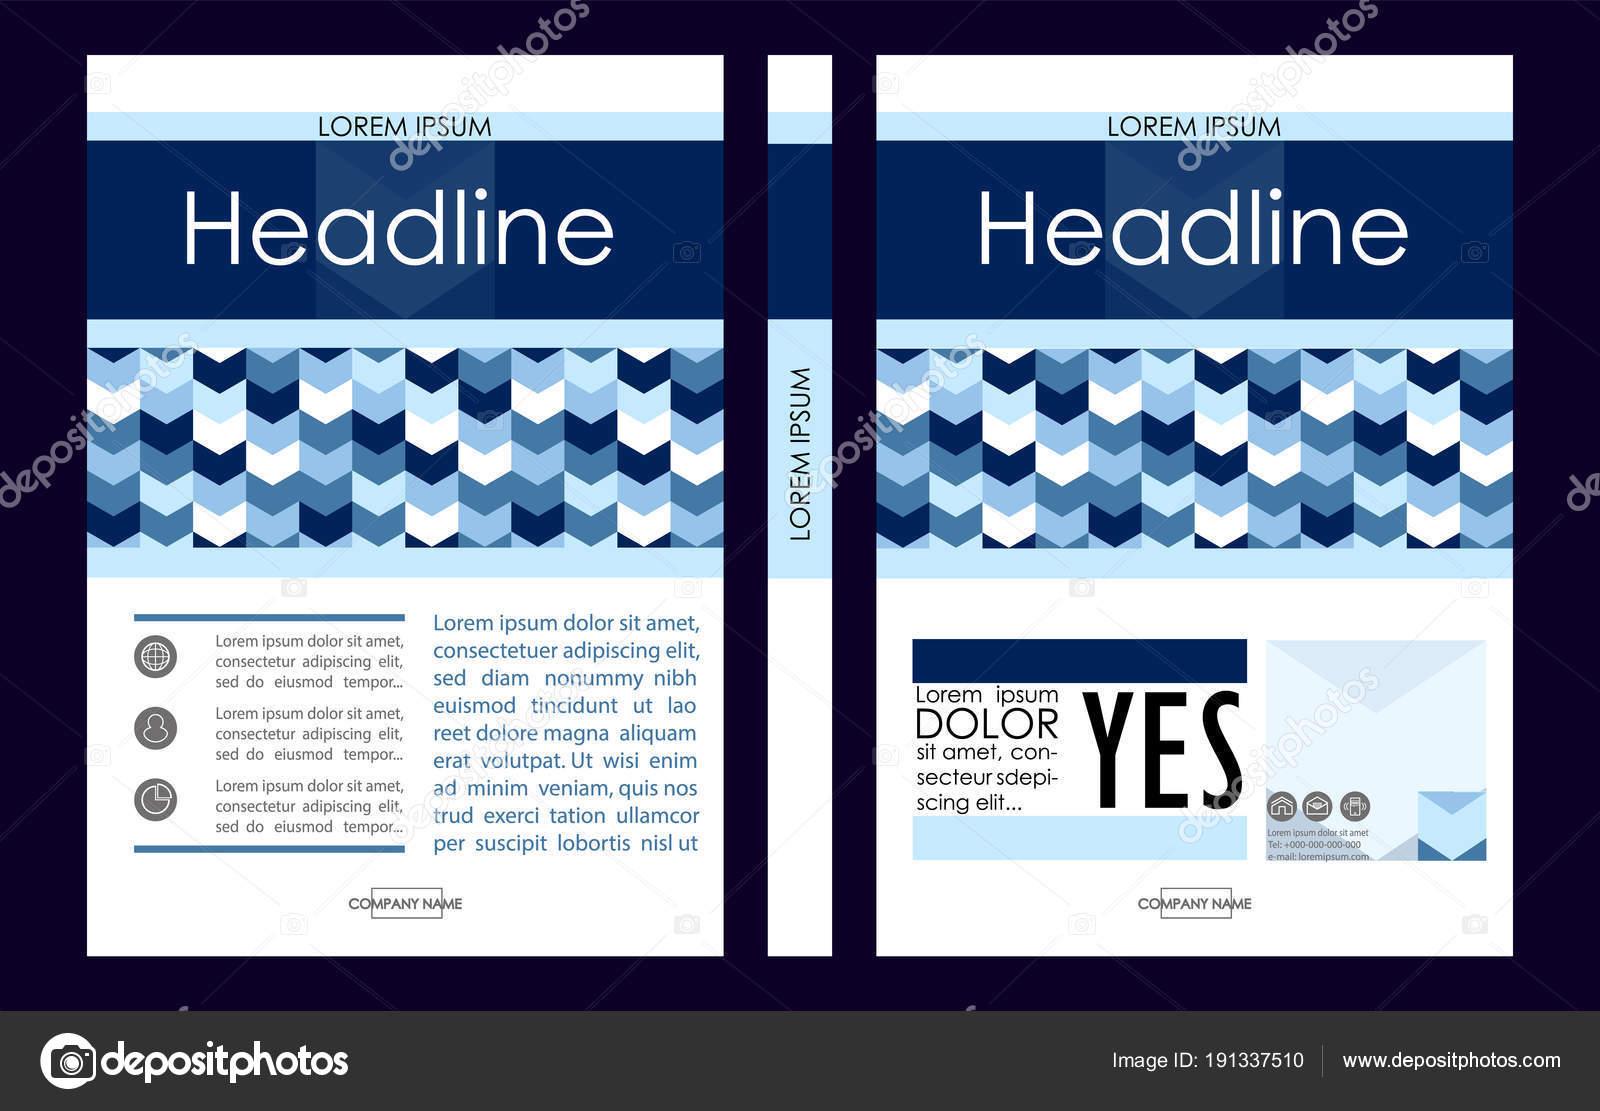 Business Deposit Book Cover ~ 블루 a 비즈니스 책 표지 디자인 서식 파일입니다 포트폴리오에 대 한 좋은 — 스톡 벡터